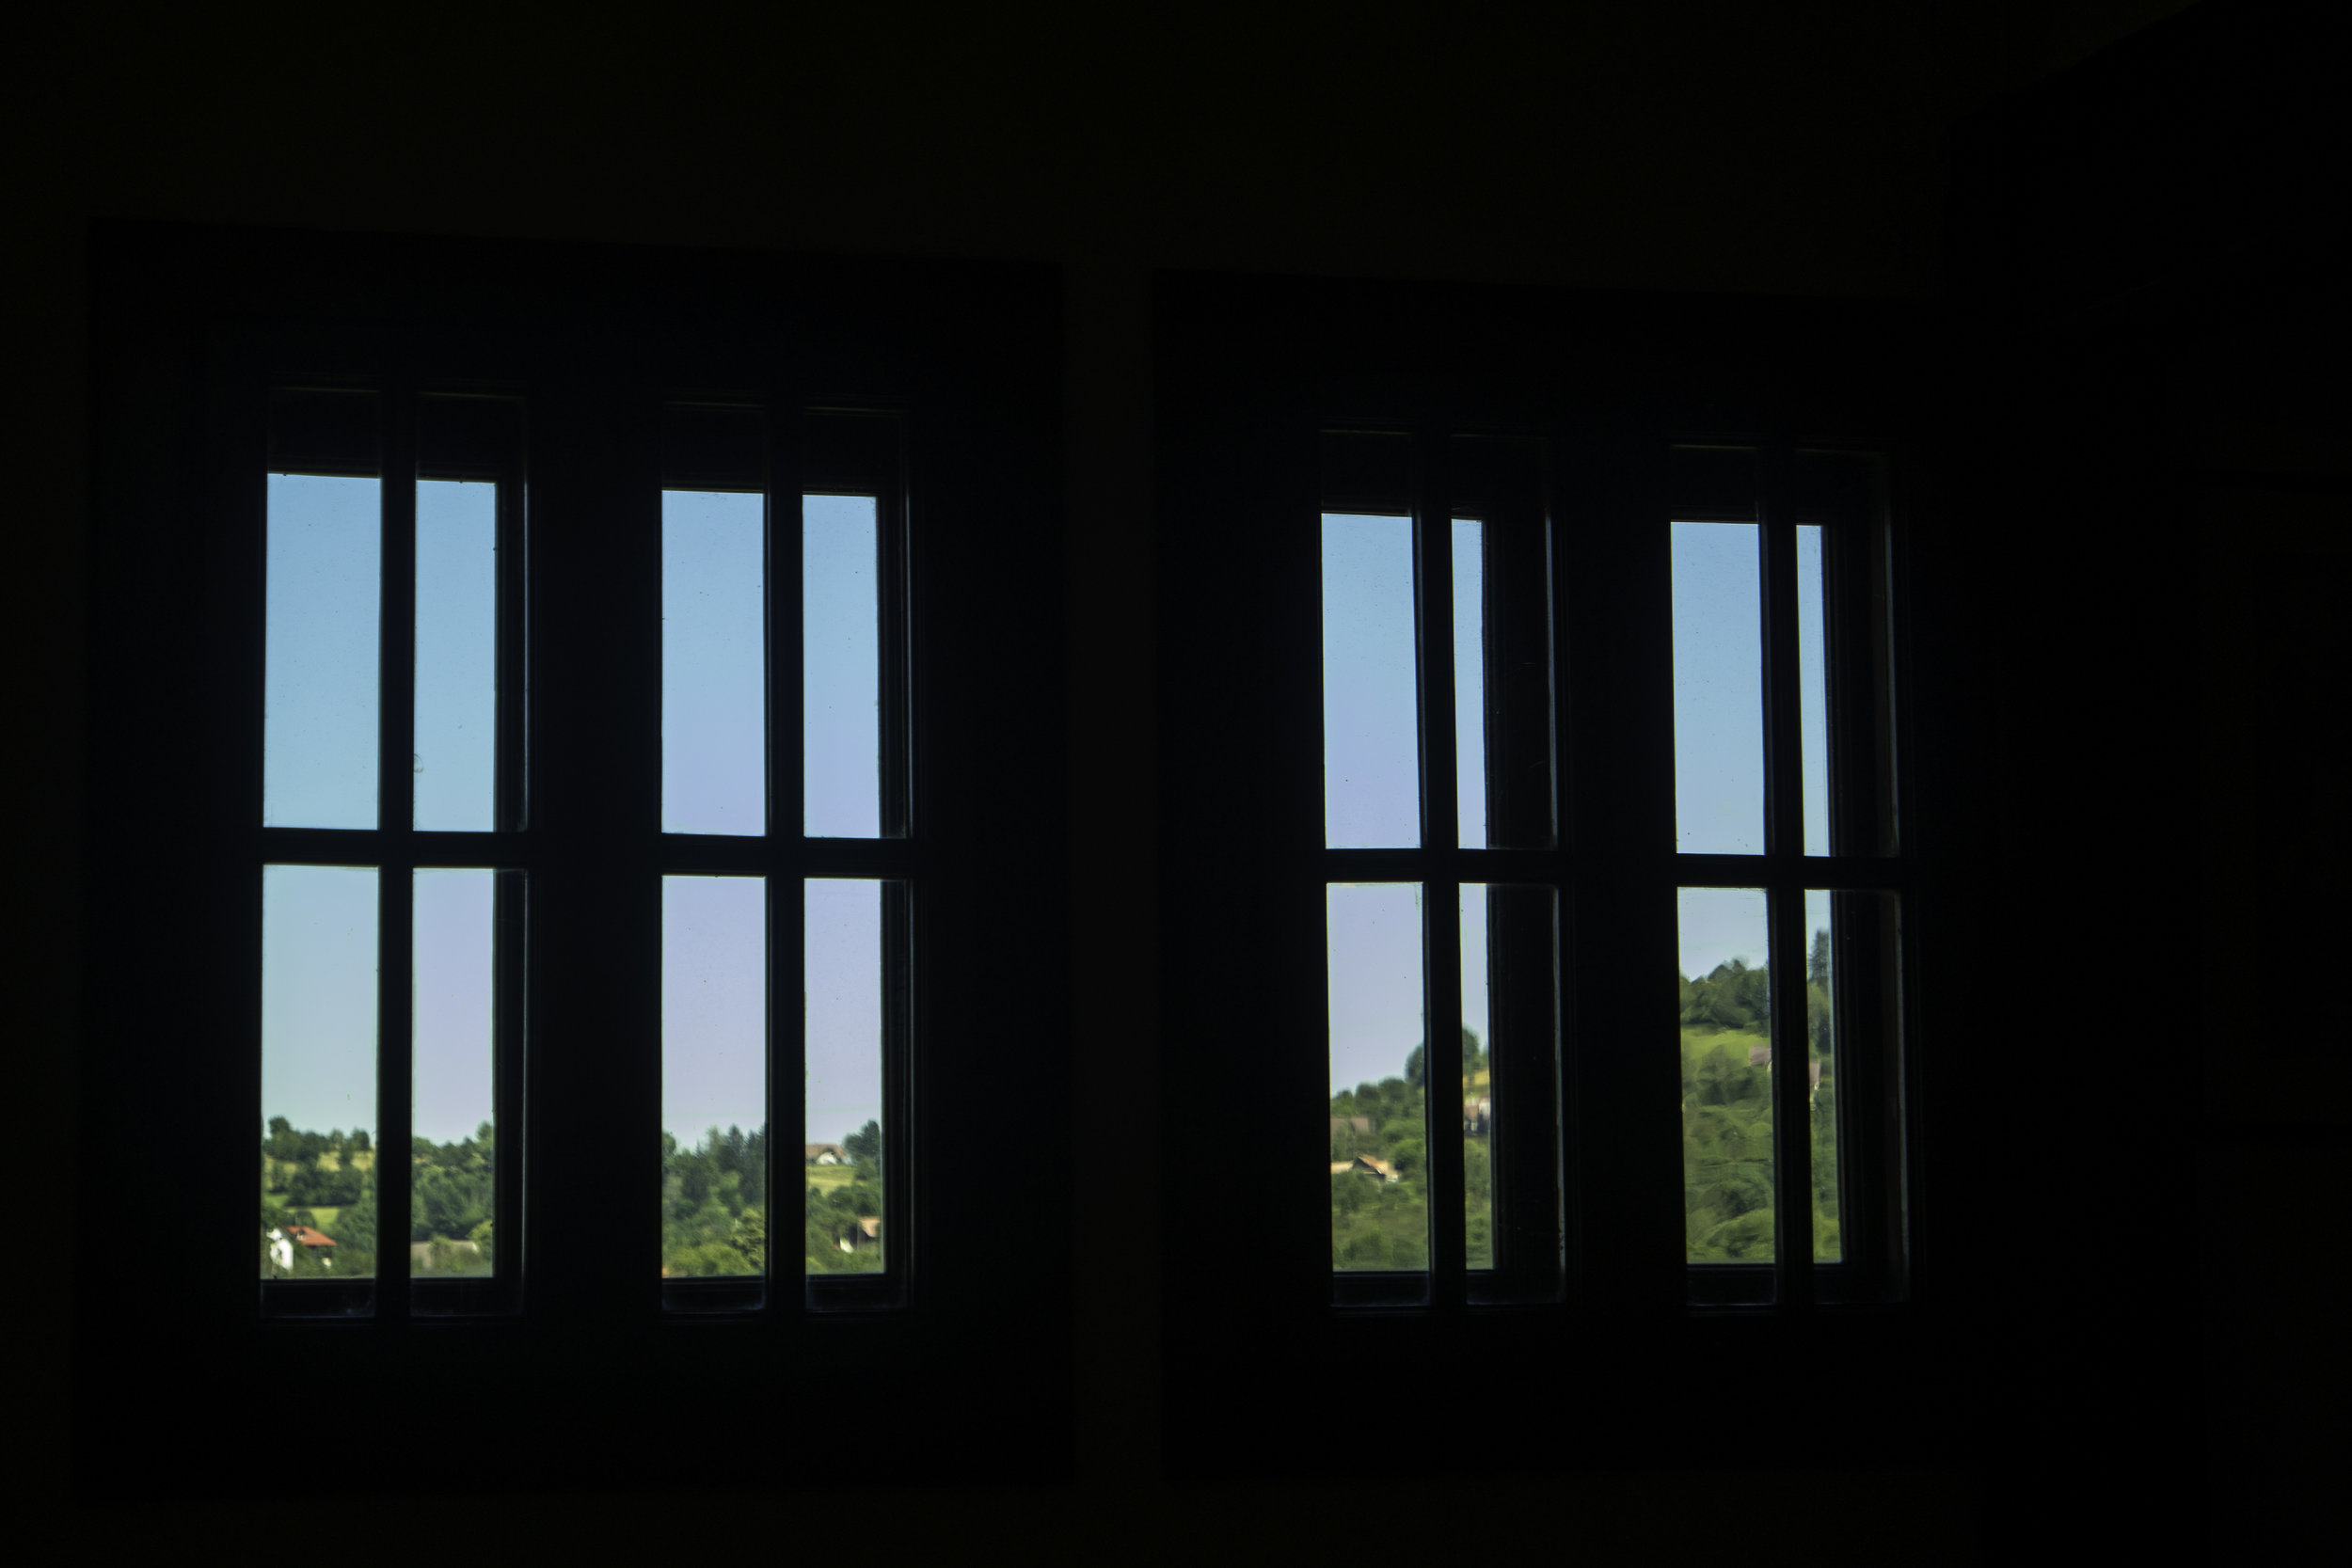 Bran-Castle-Romania-two-blue-windows.jpg